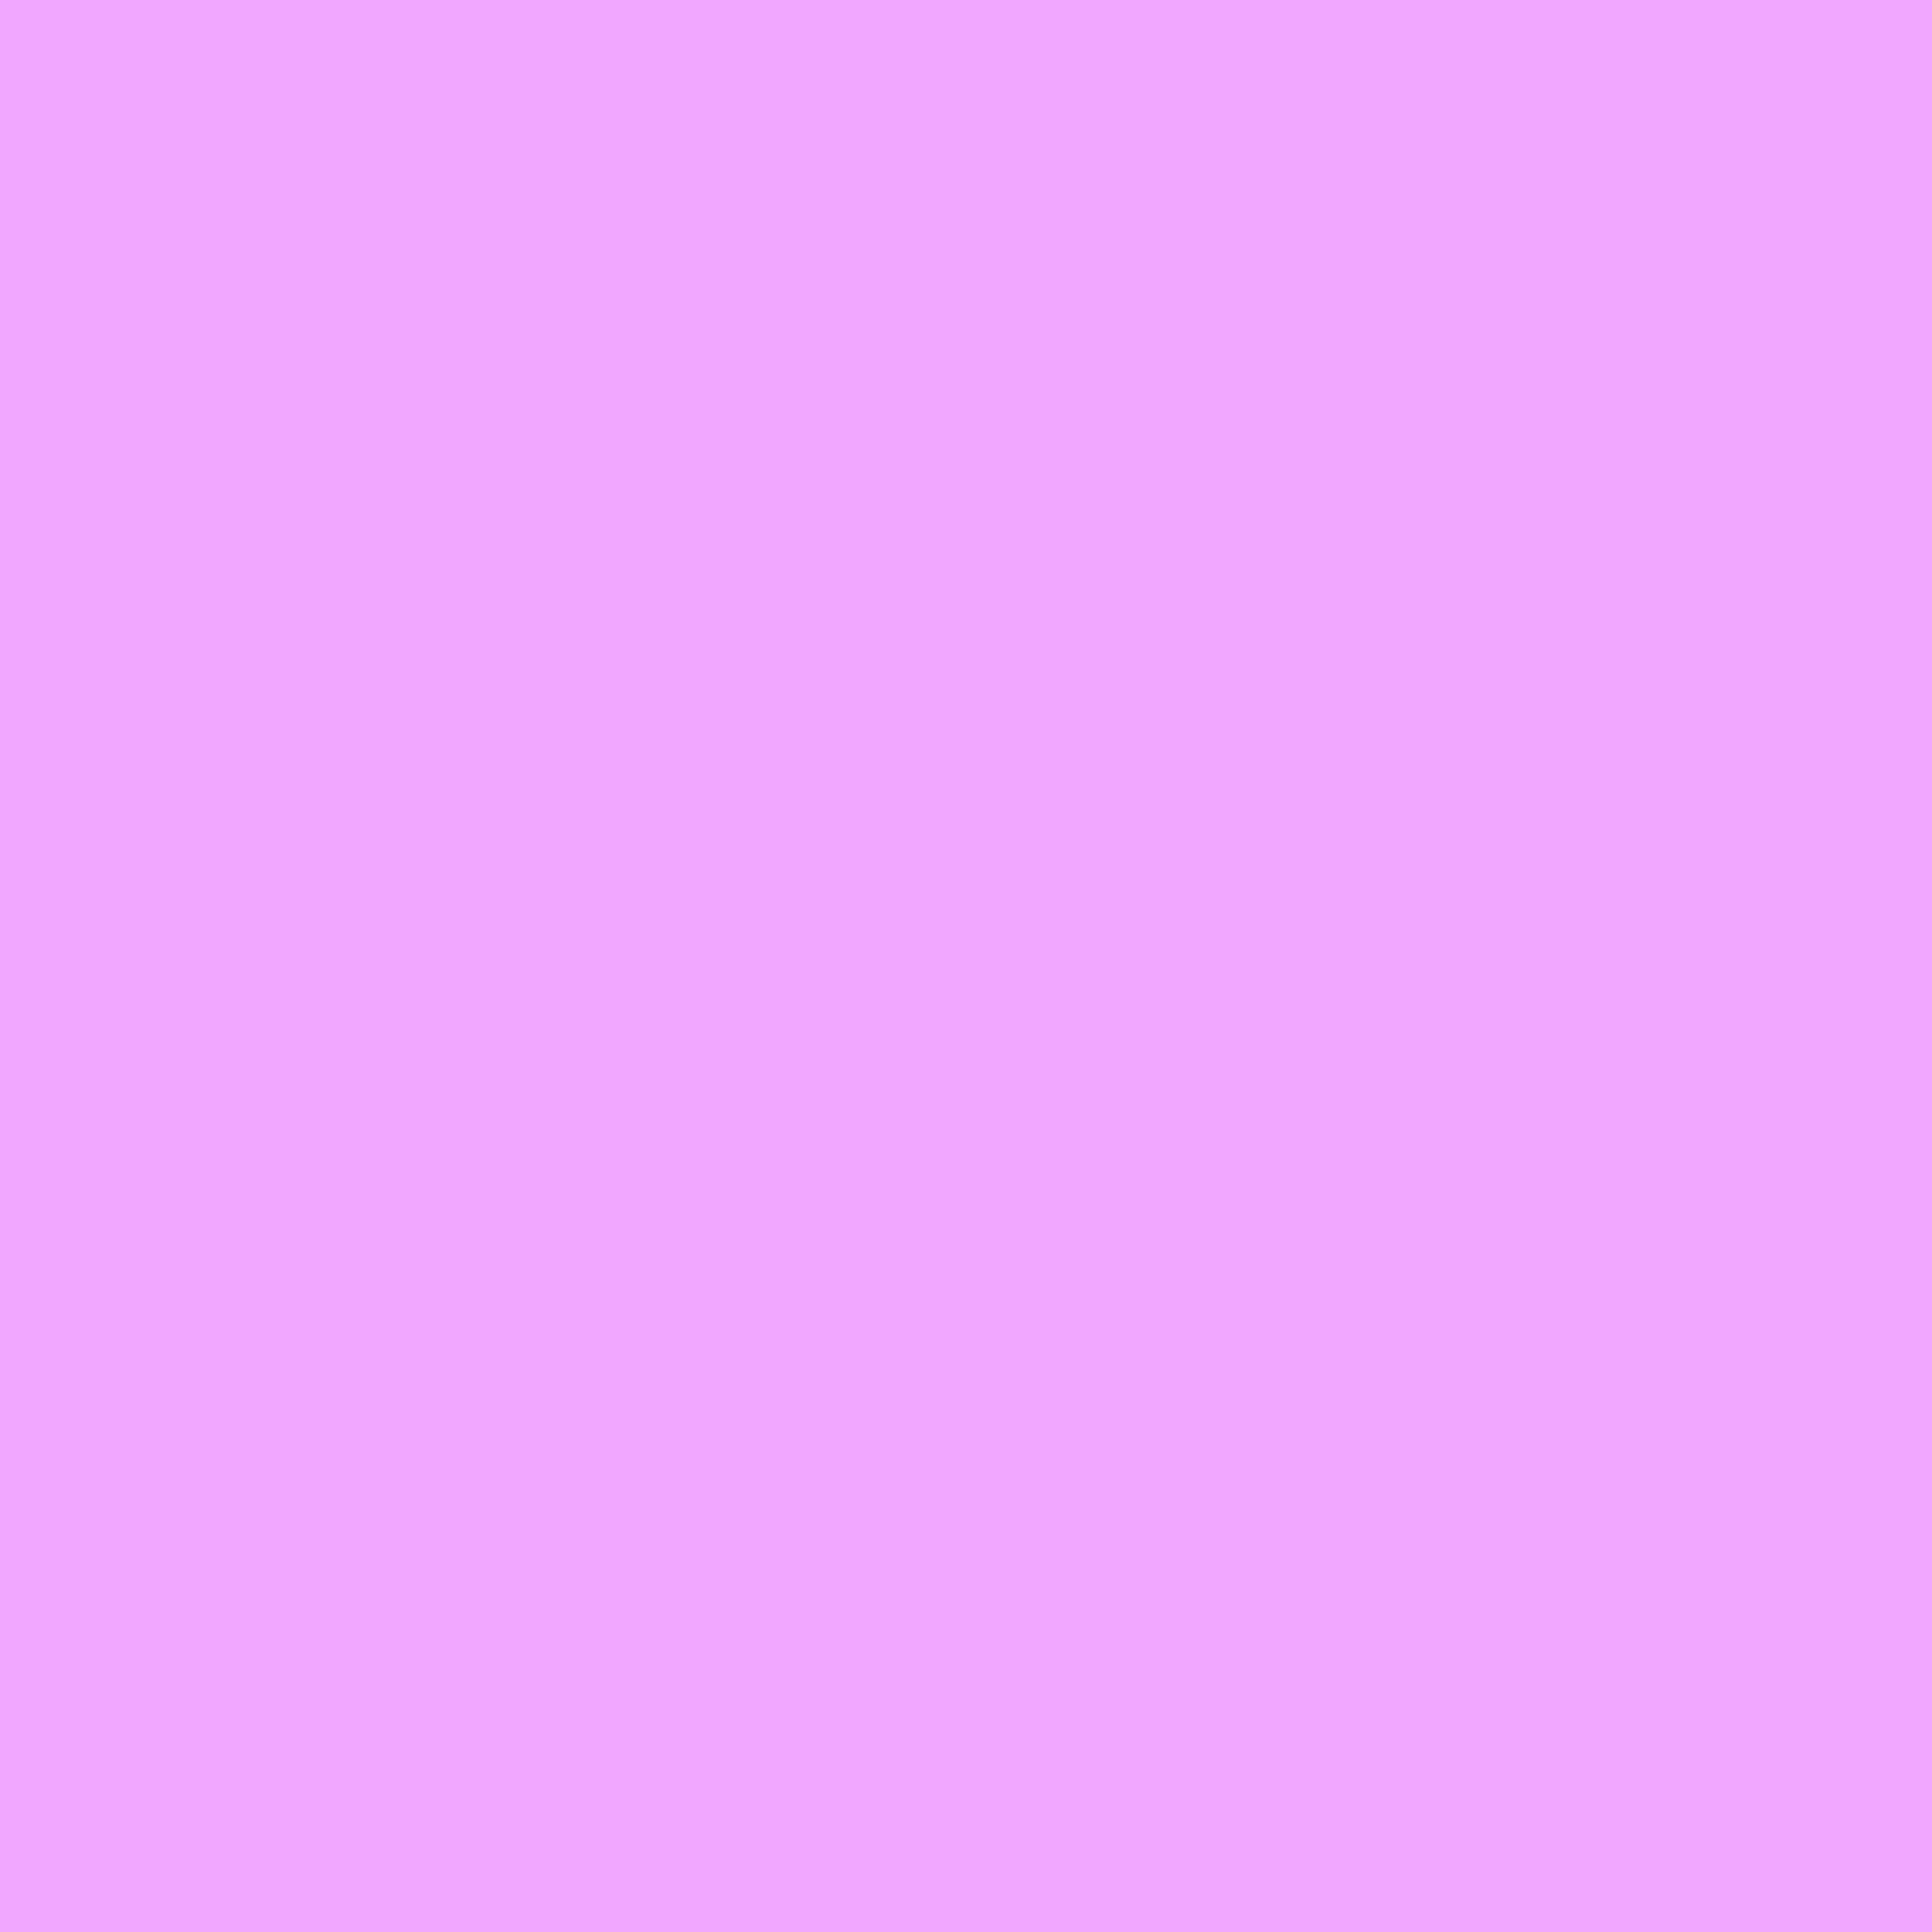 2048x2048 Rich Brilliant Lavender Solid Color Background